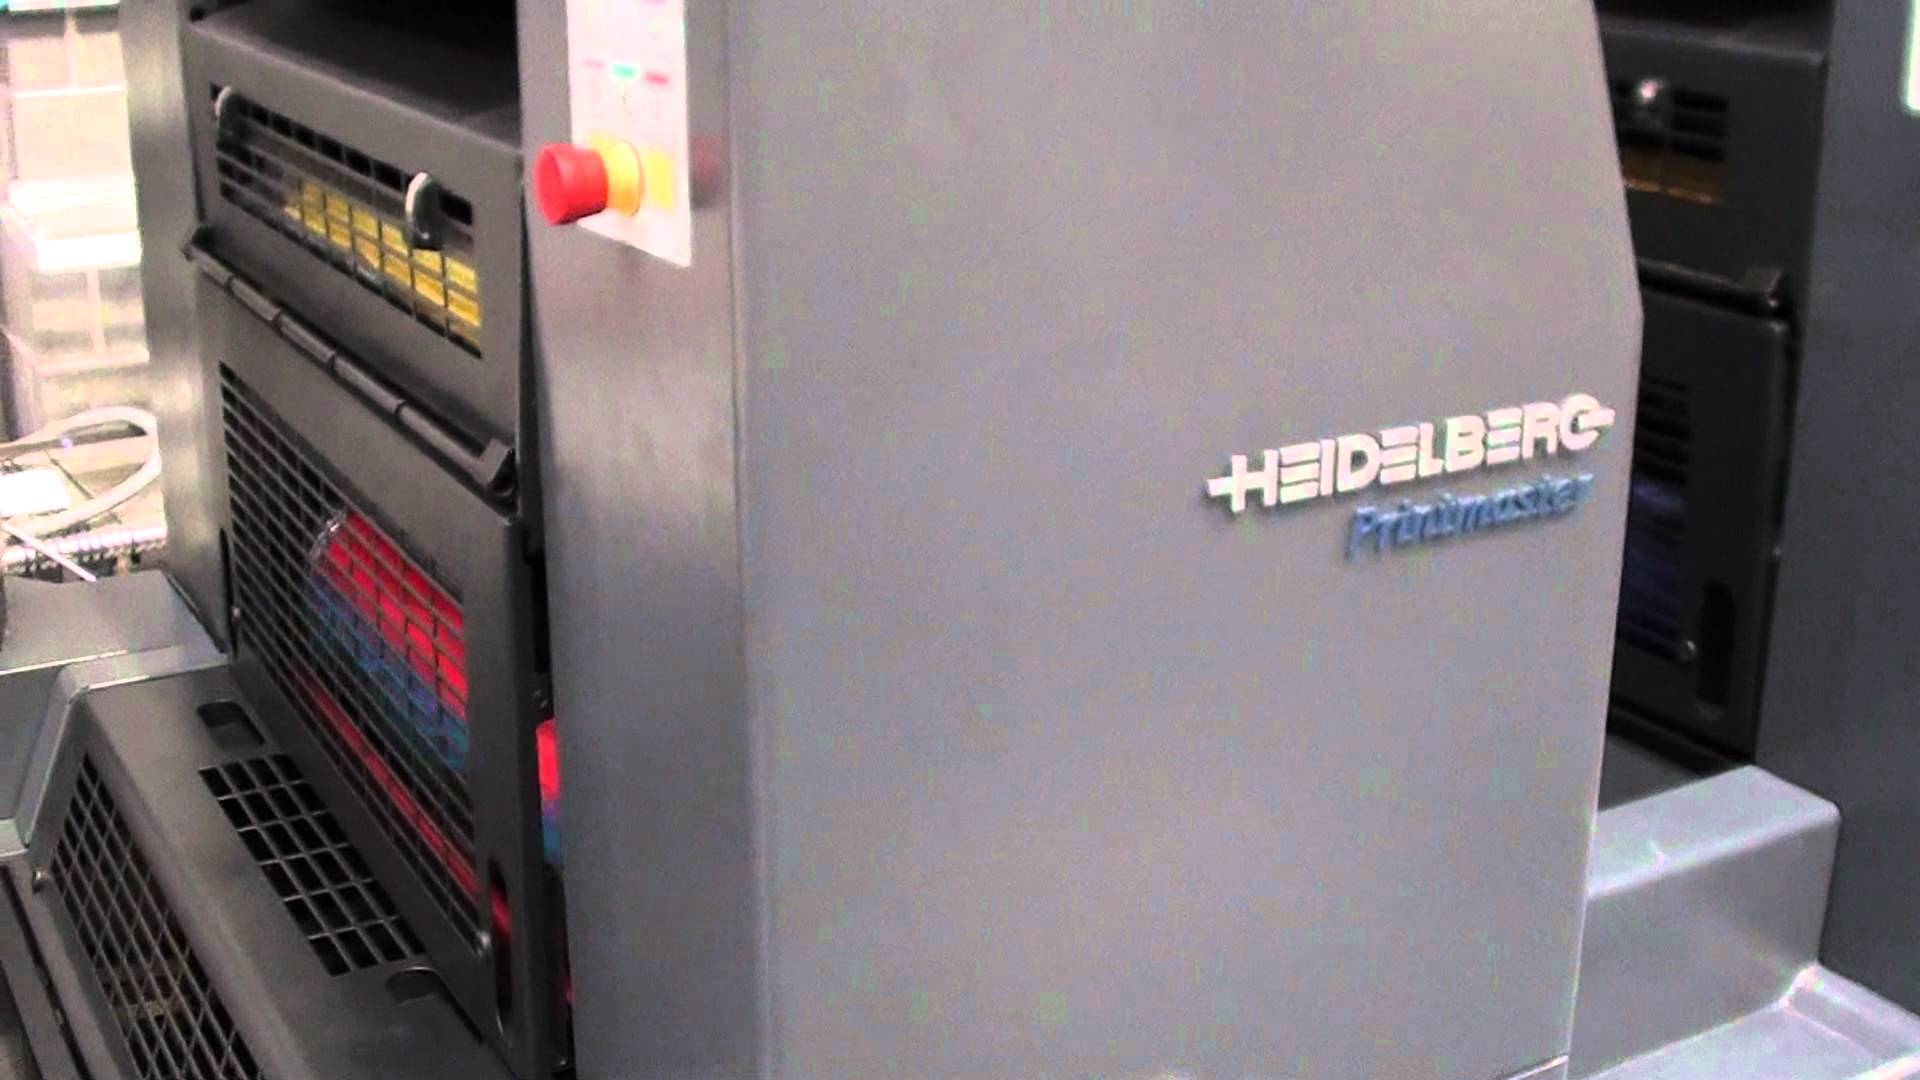 Heidelberg Printmaster 46-1